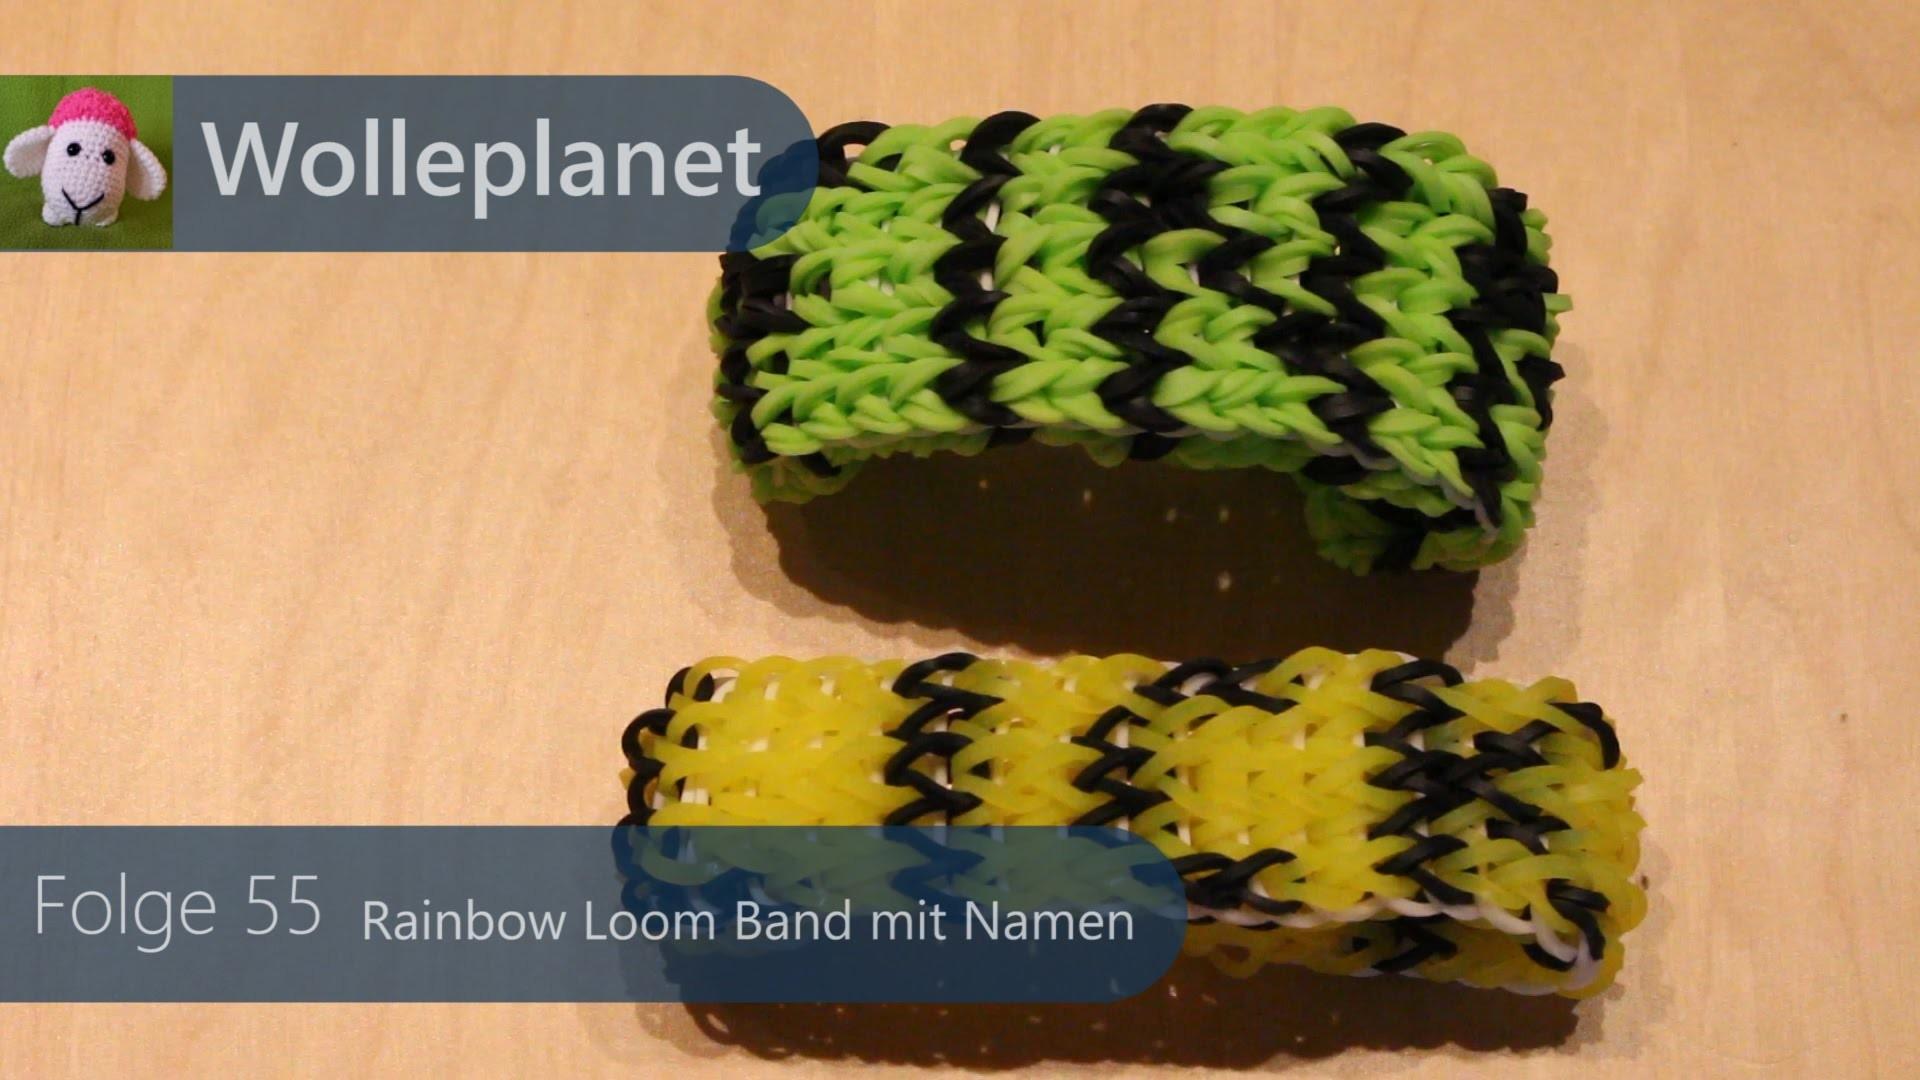 Rainbow Loom Band mit Namen